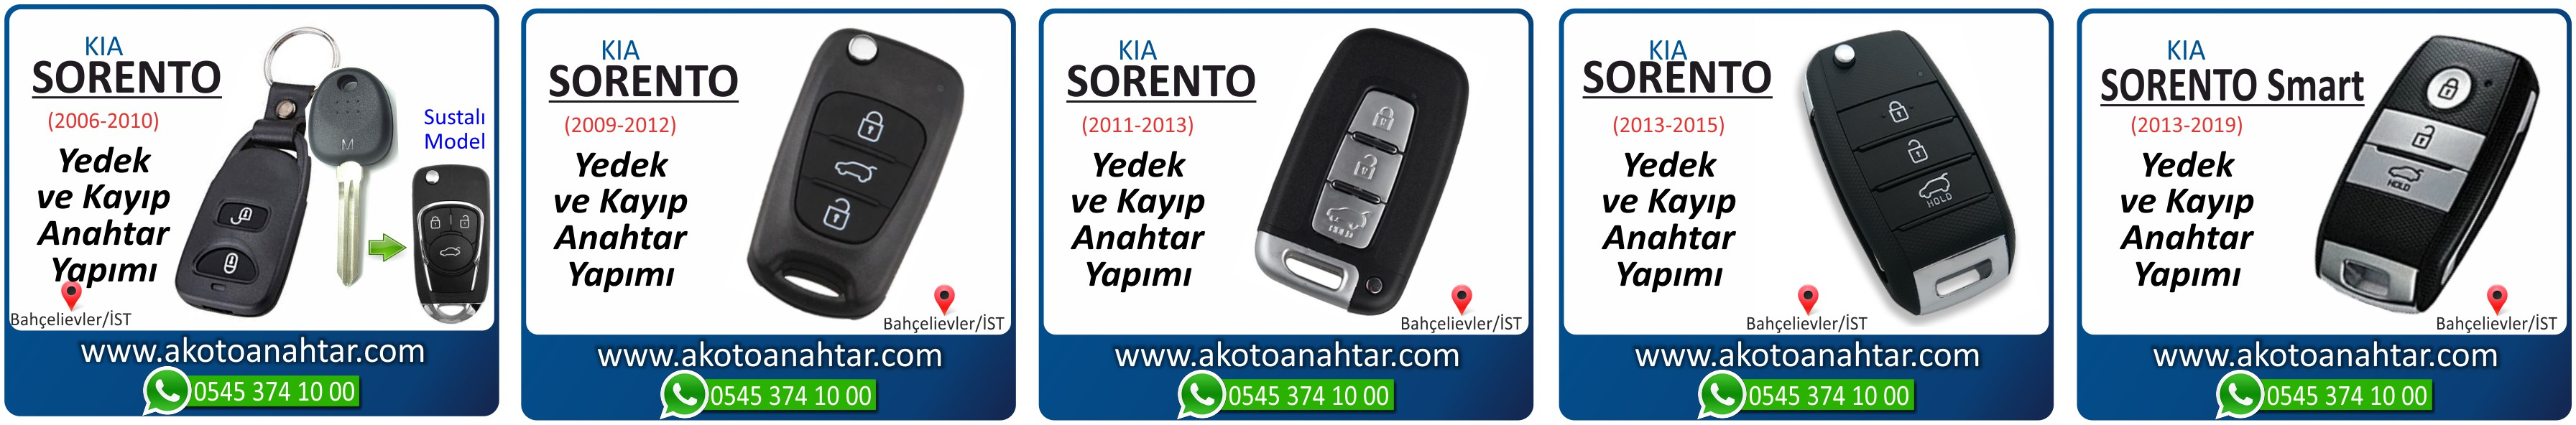 kia sorrento anahtari - Kia Sorento Smart Anahtarı | Yedek ve Kayıp Anahtar Yapımı